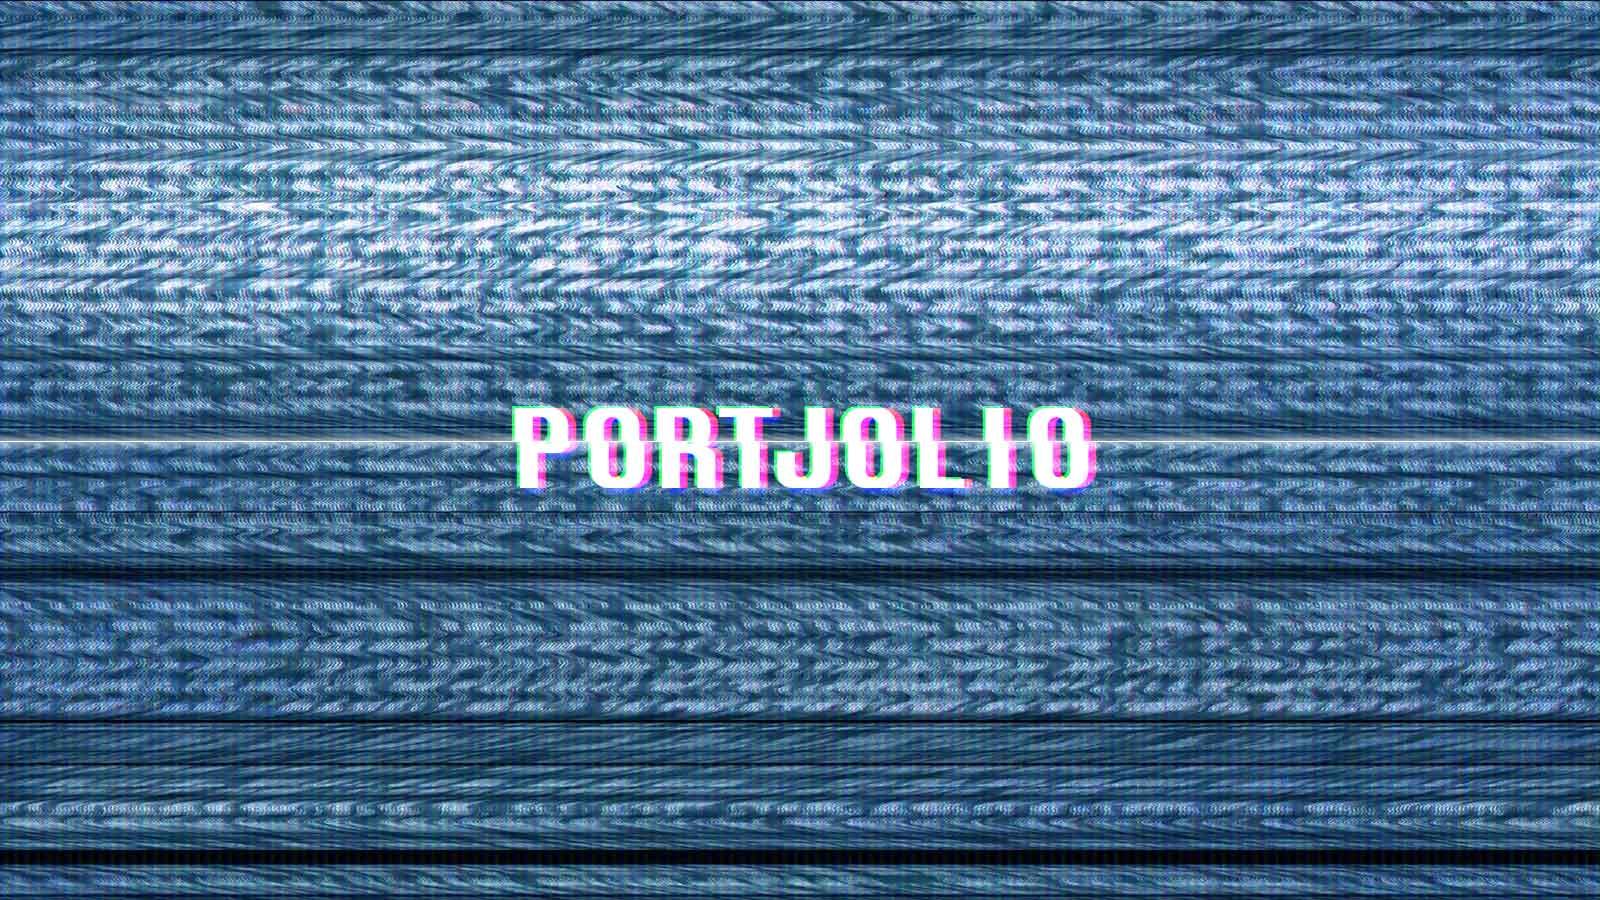 Photoshop – Portjolio